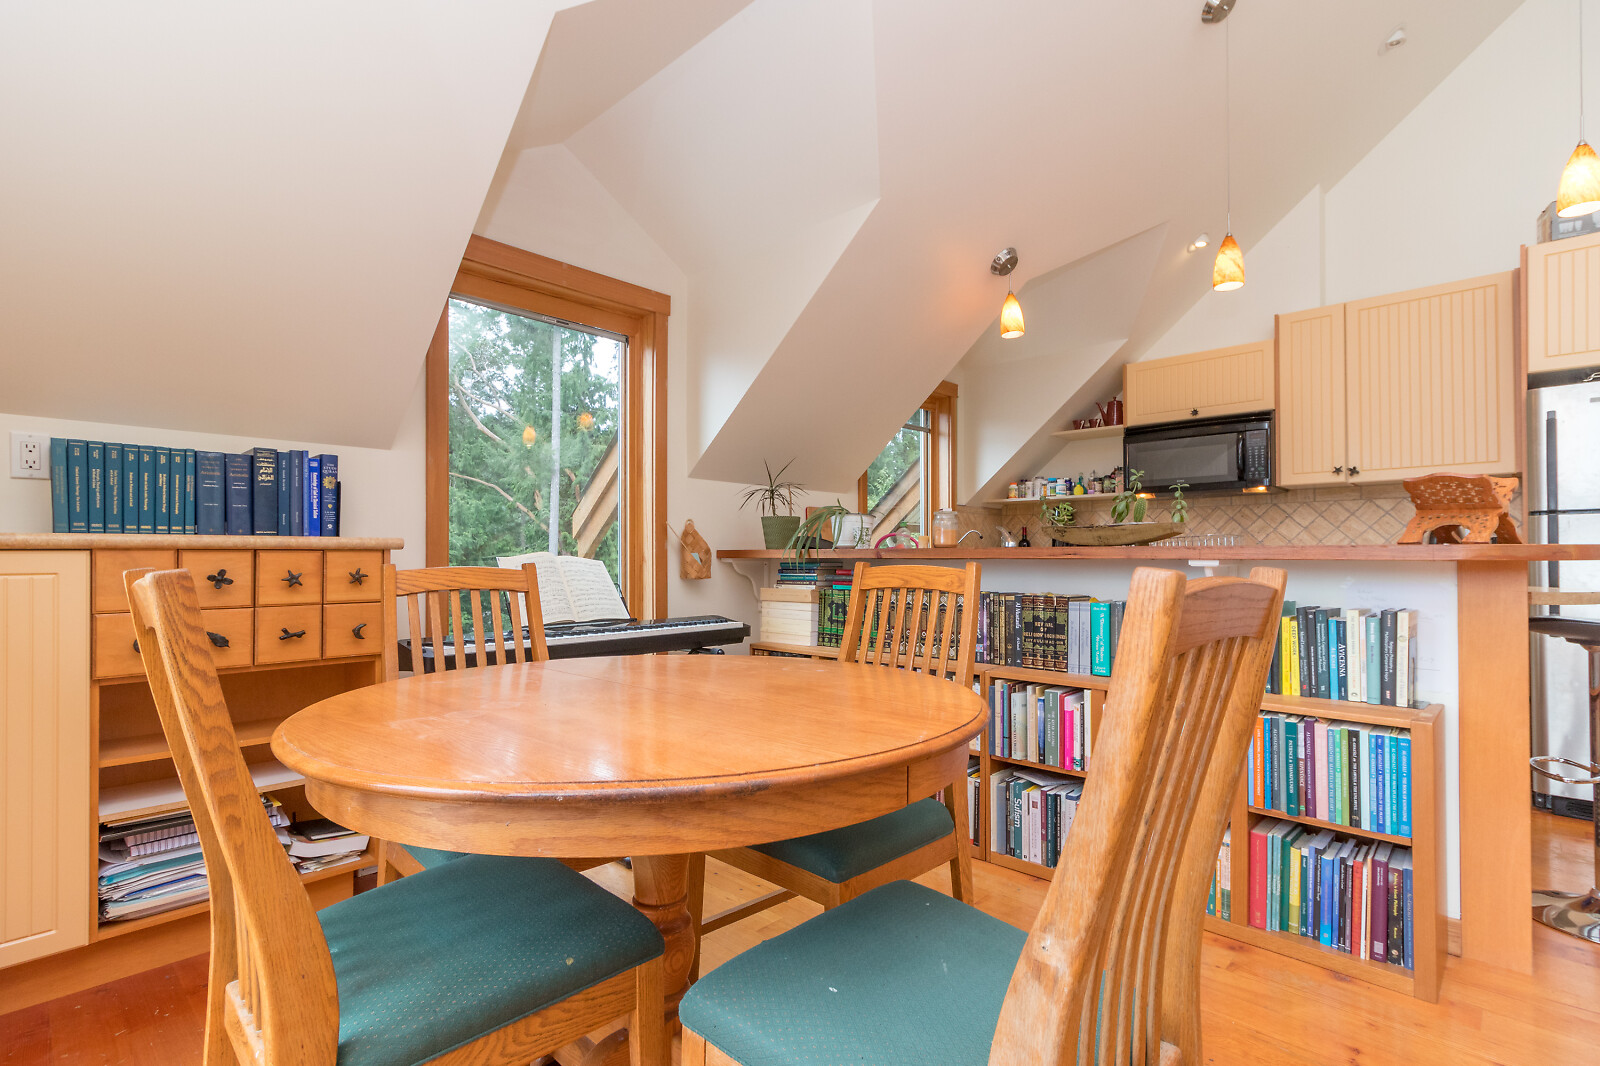 4362 Brentview Dr, Cowichan Bay, British Columbia  V0R 1N2 - Photo 9 - 868691